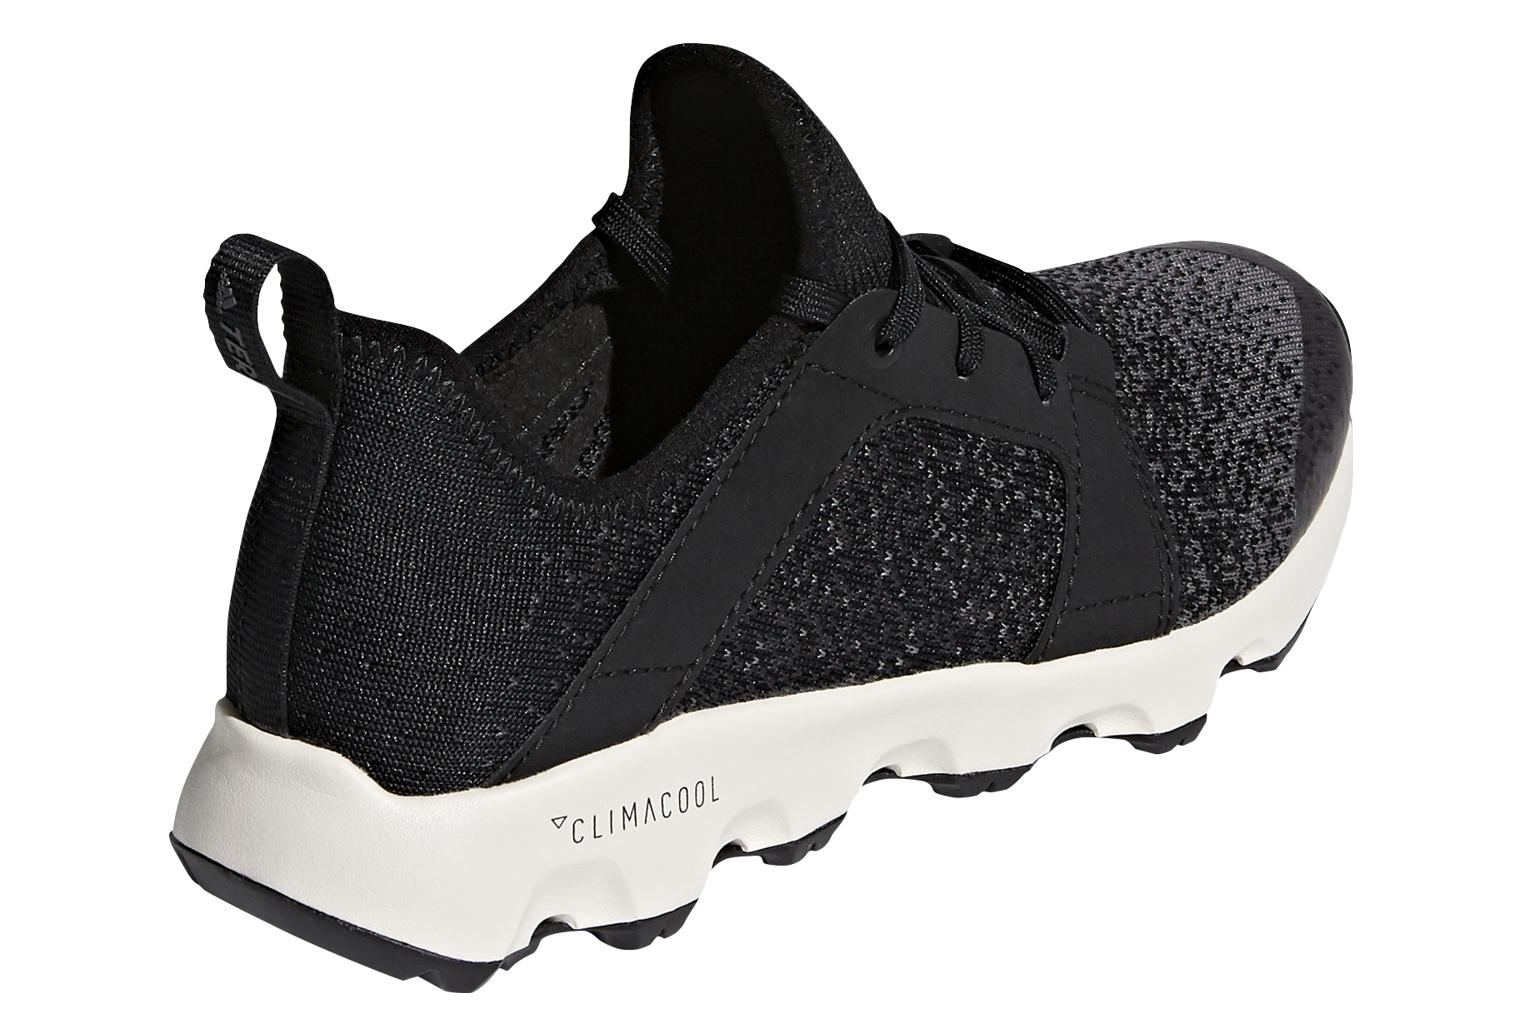 Chaussures femme adidas Terrex Climacool Voyager Sleek Parley